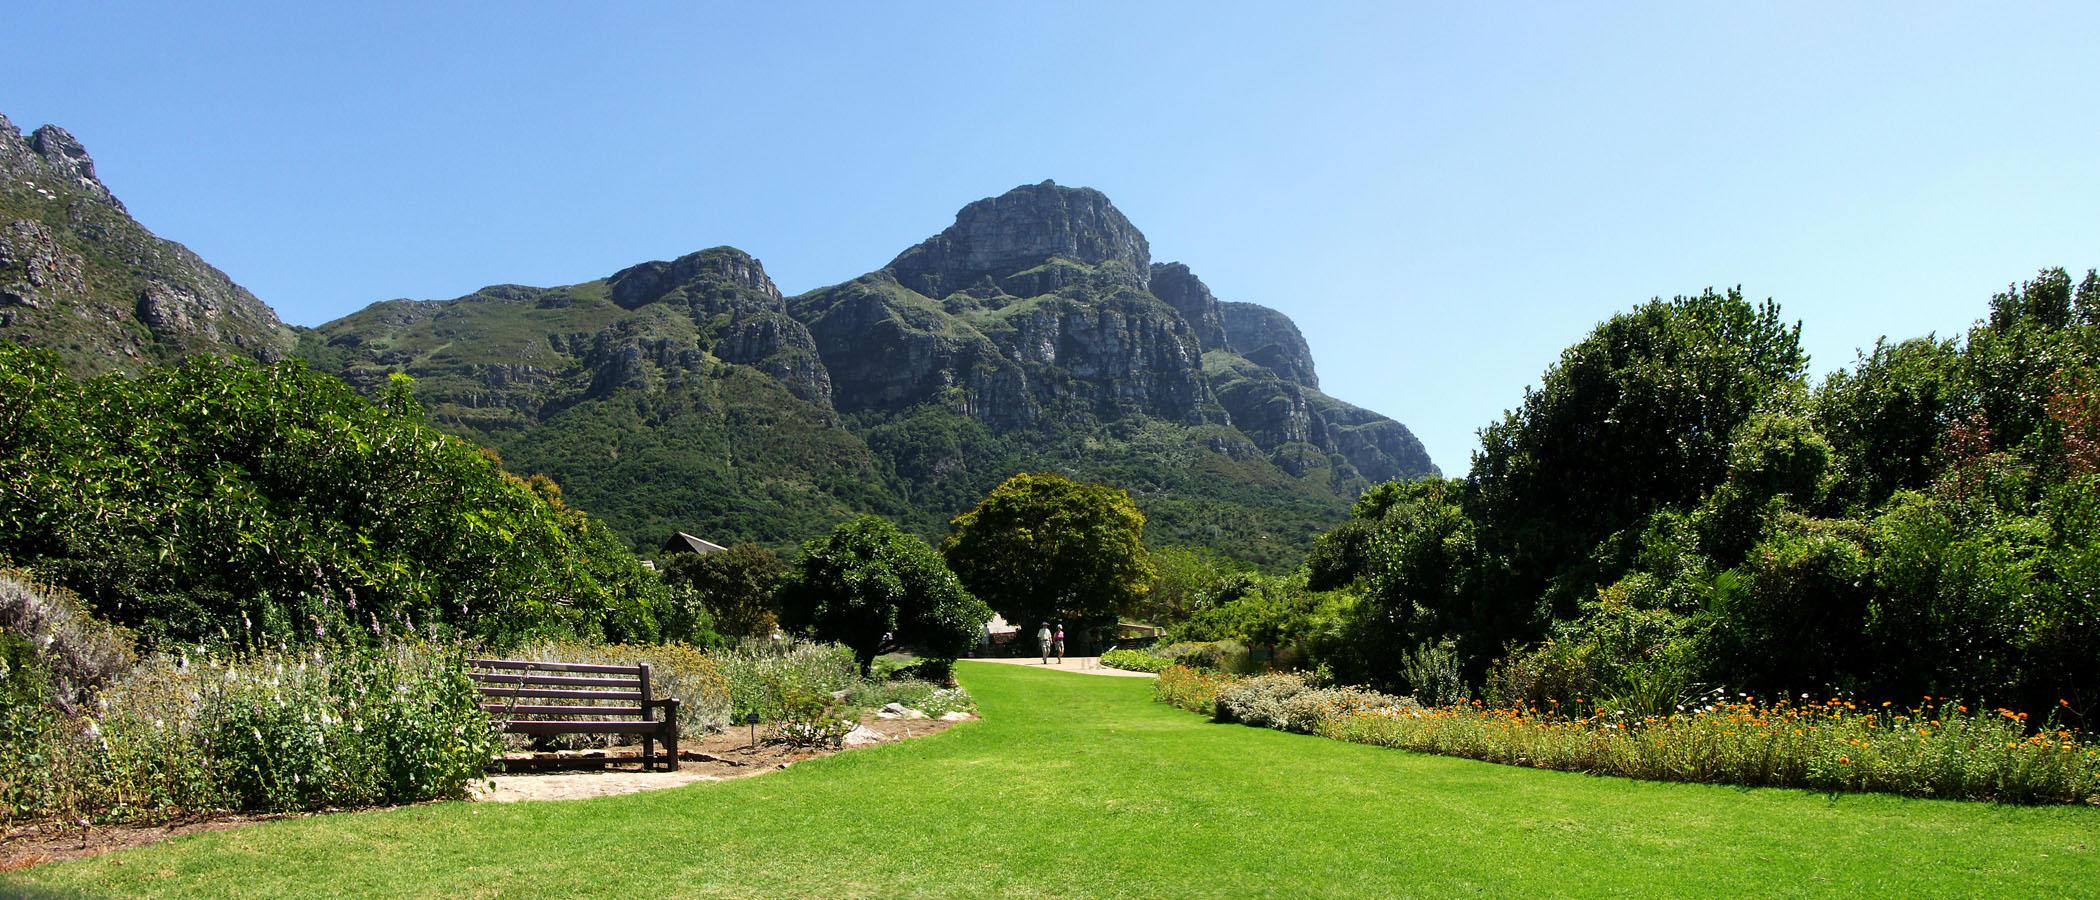 Come arrivare ai Giardini Botanici Nazionali Kirstenbosch di Cape Town